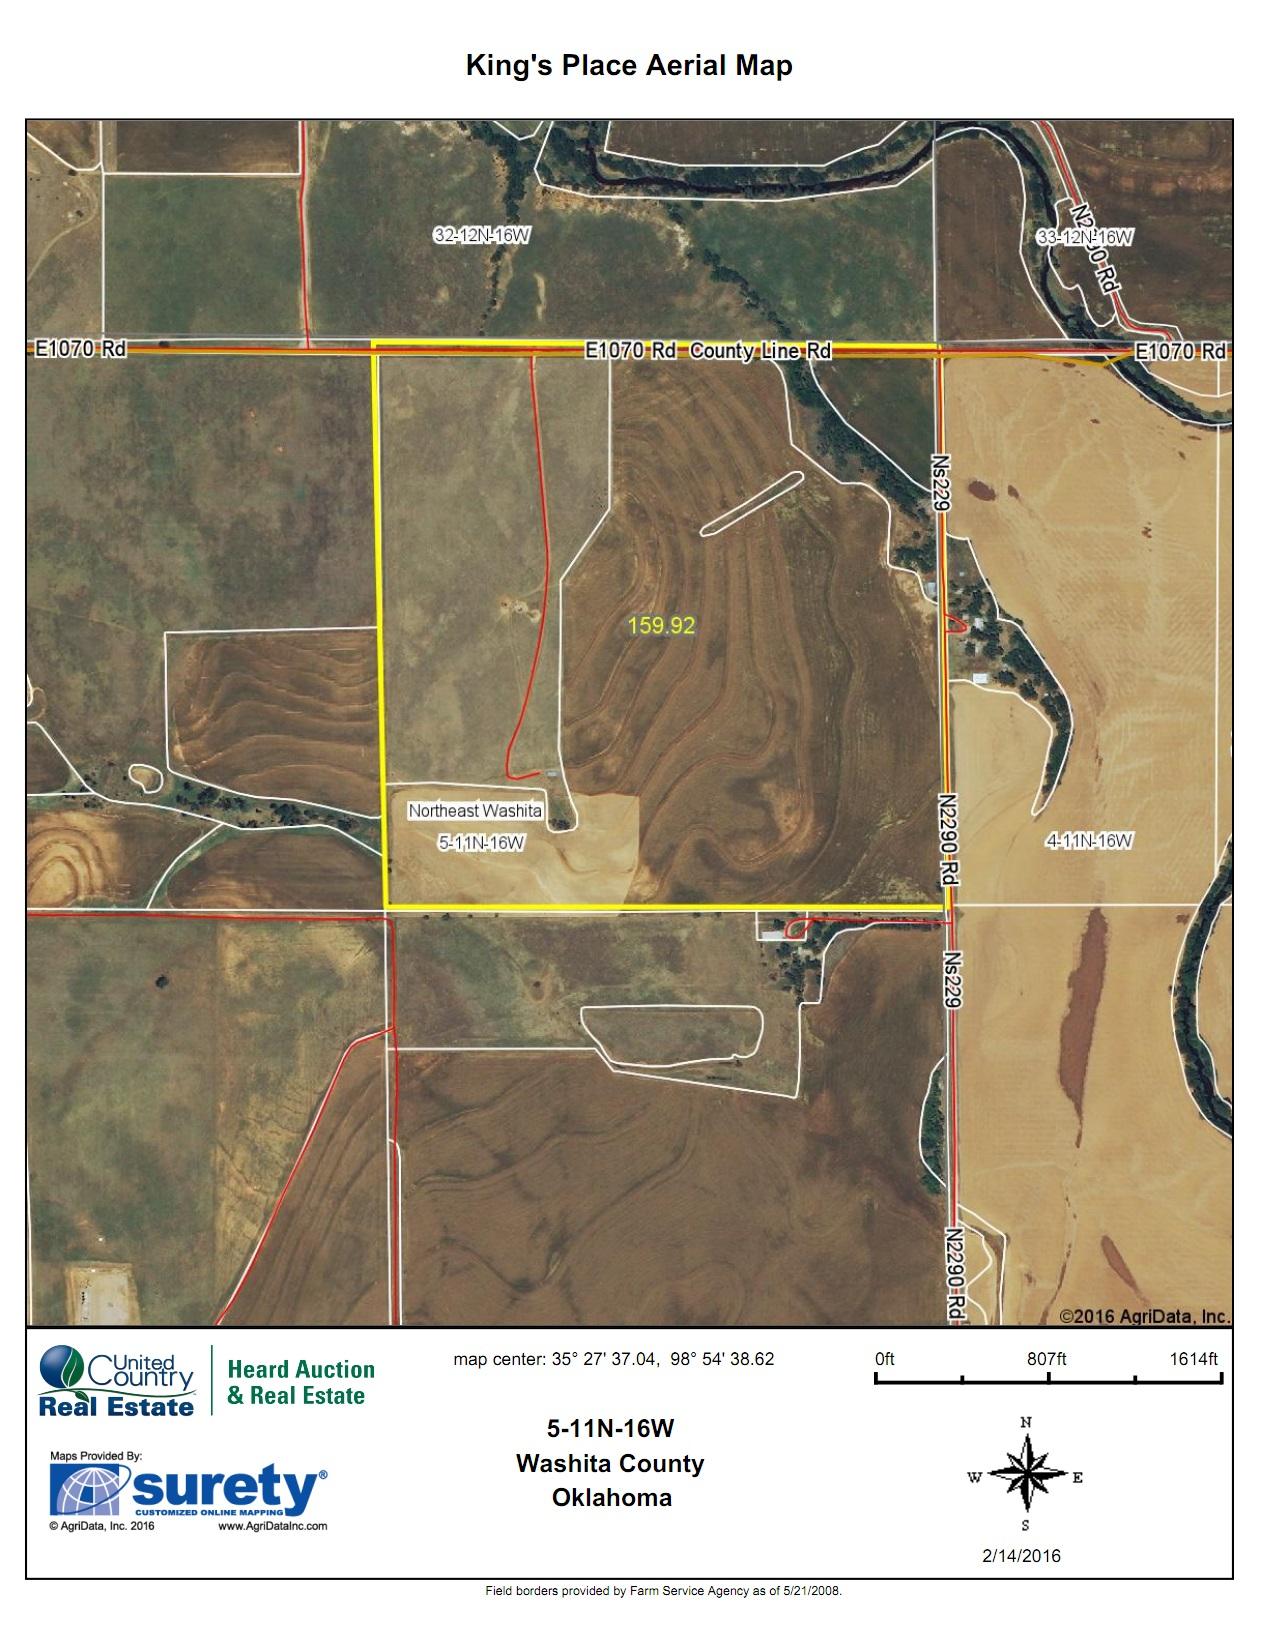 Oklahoma Farm for Sale, Washita County, Tract 8